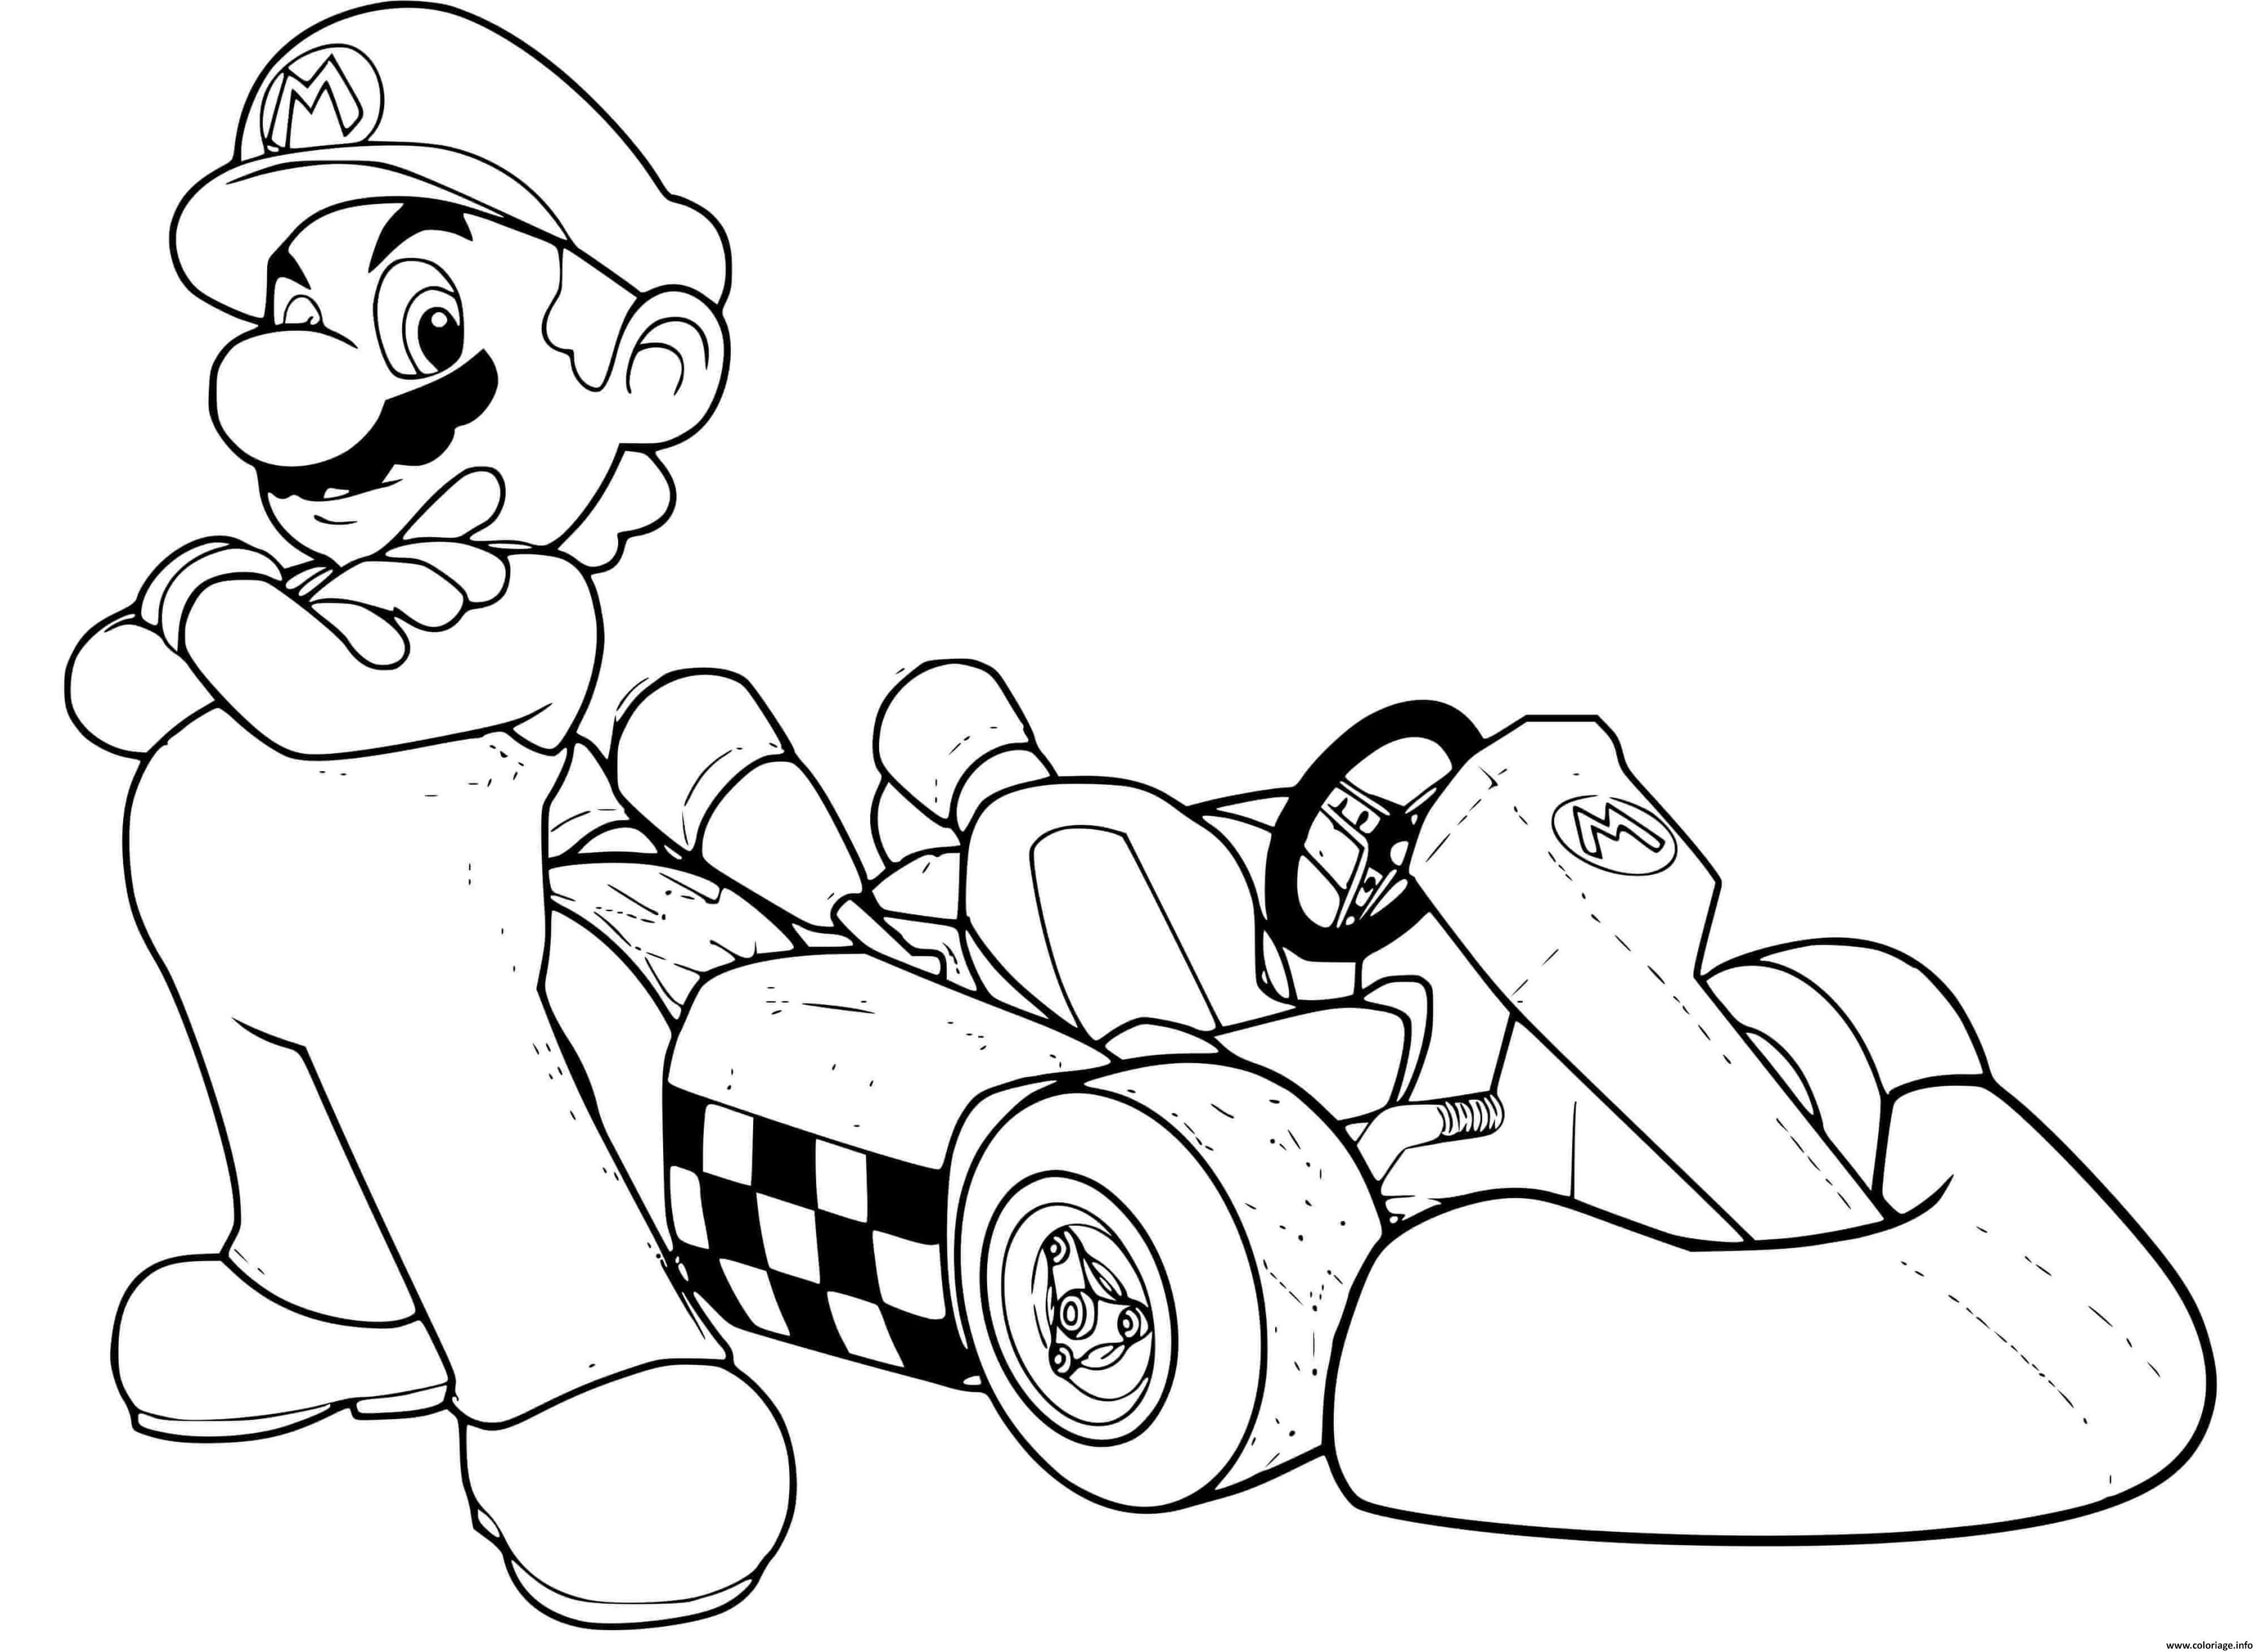 Coloriage Mario Voiture De Crouse Bros Dessin Mario Bros à imprimer